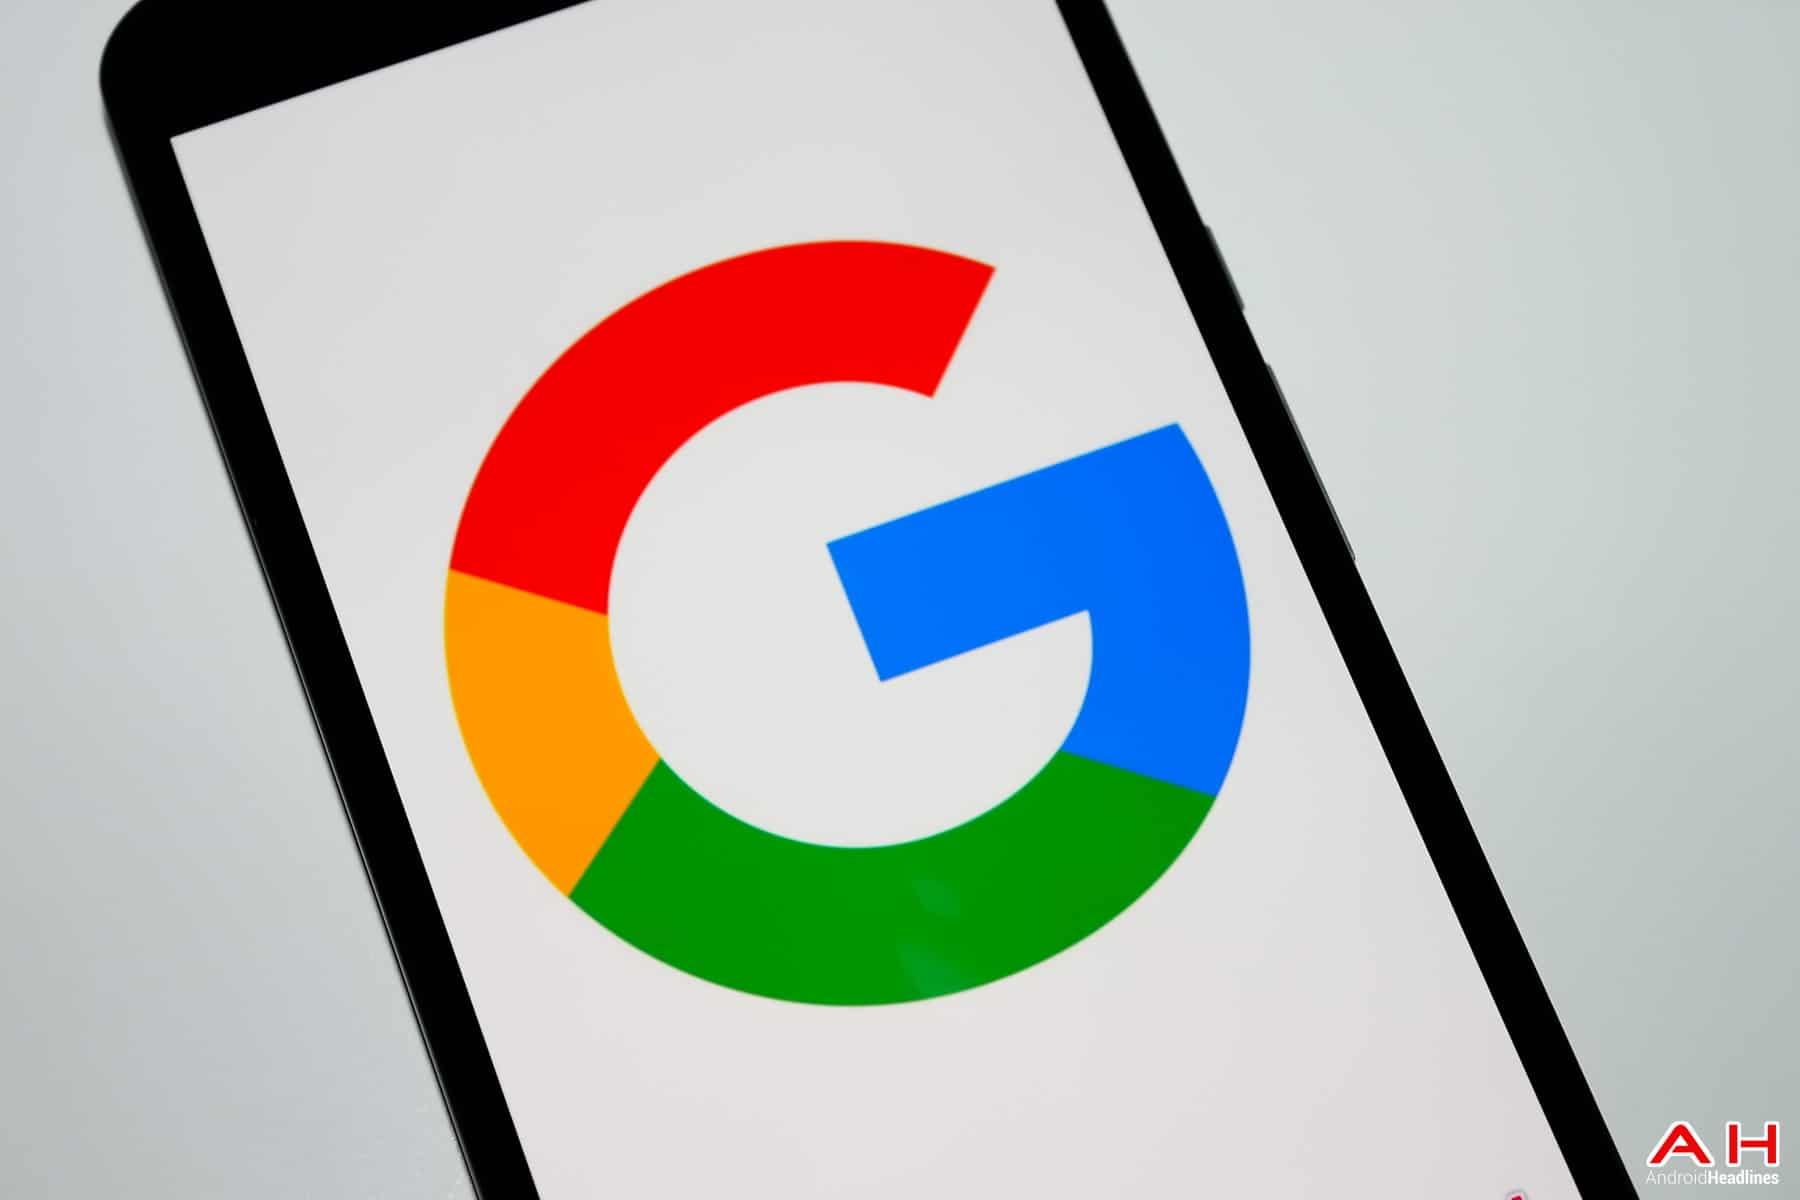 AH 2015 A New Google LOGO 2511